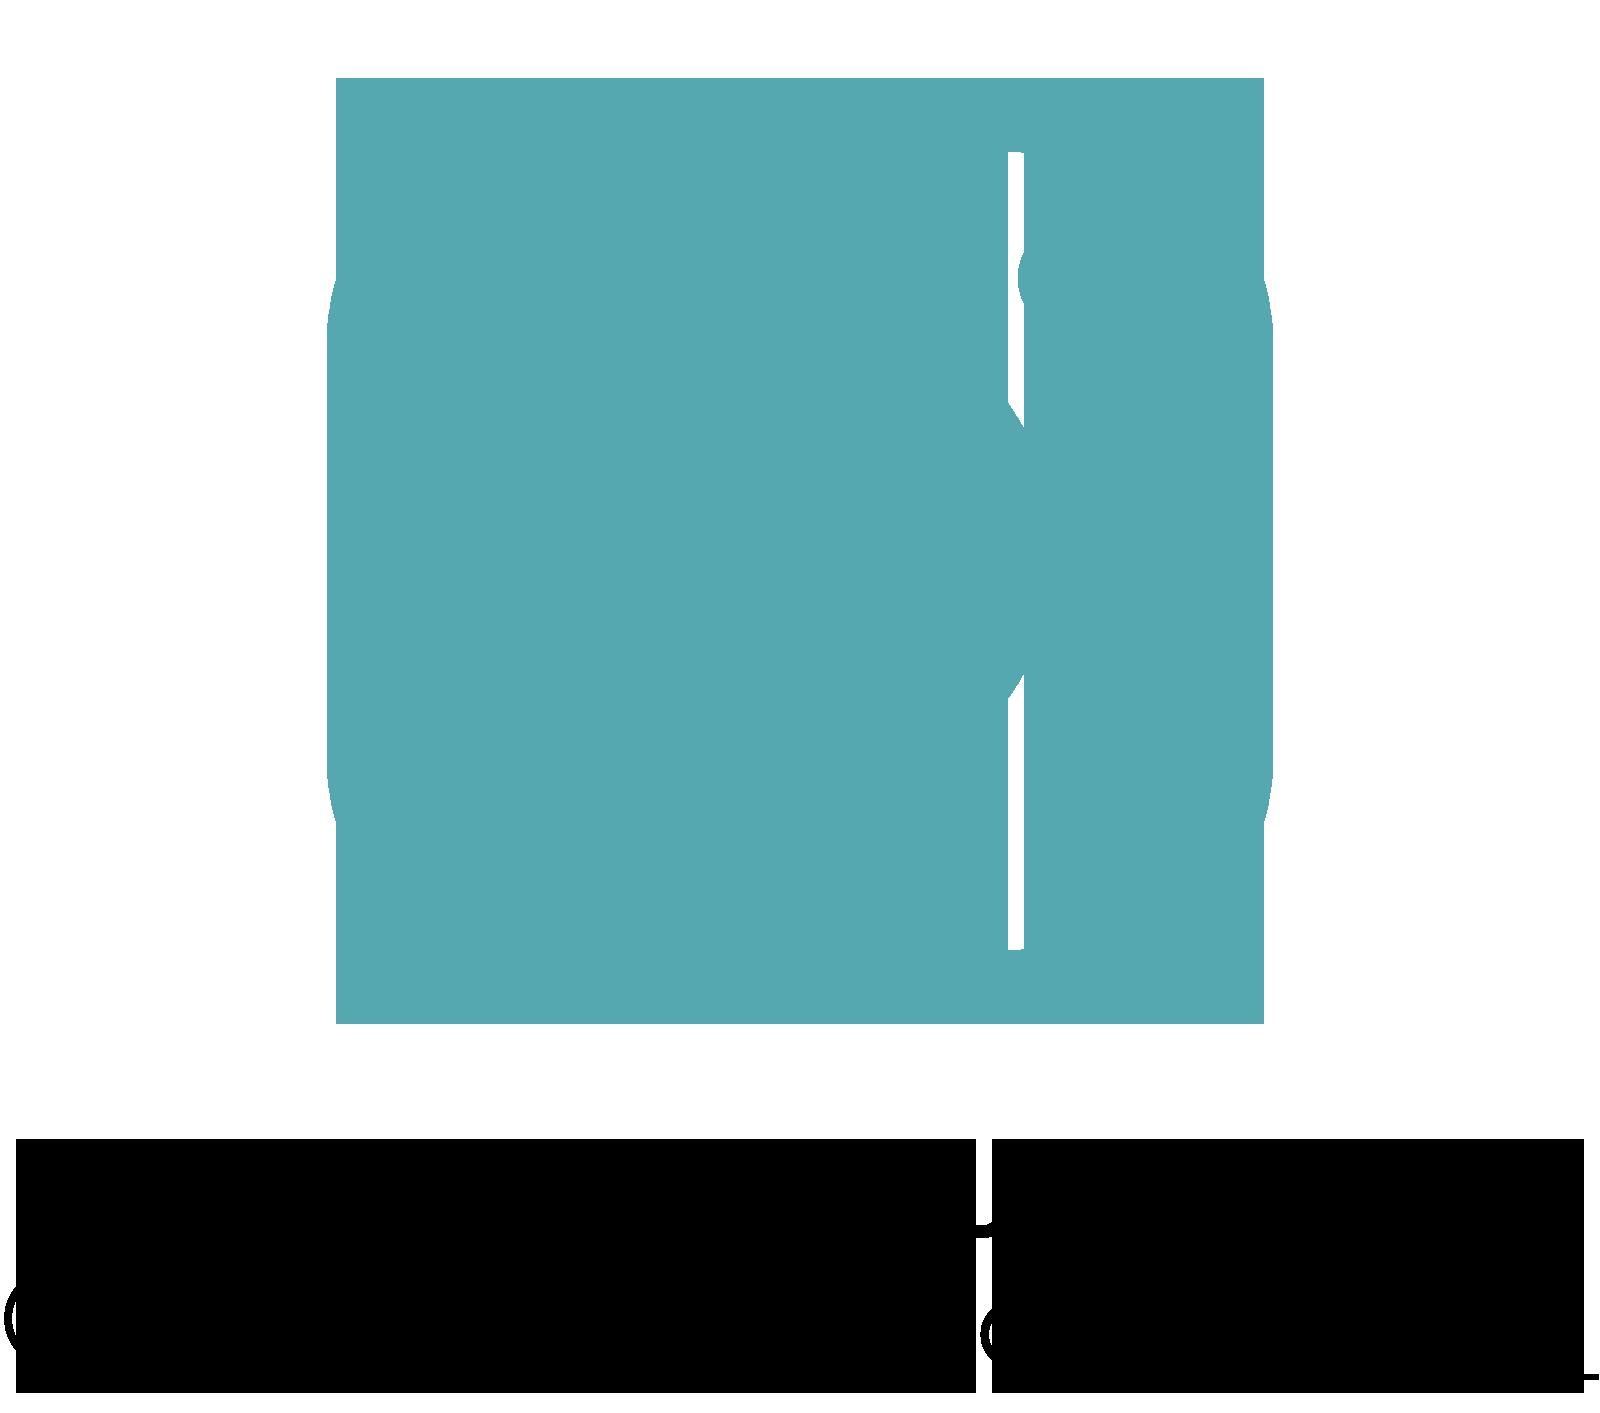 Image of Instagram icon. Follow us - KissAndMakeupCosmetics_ account.